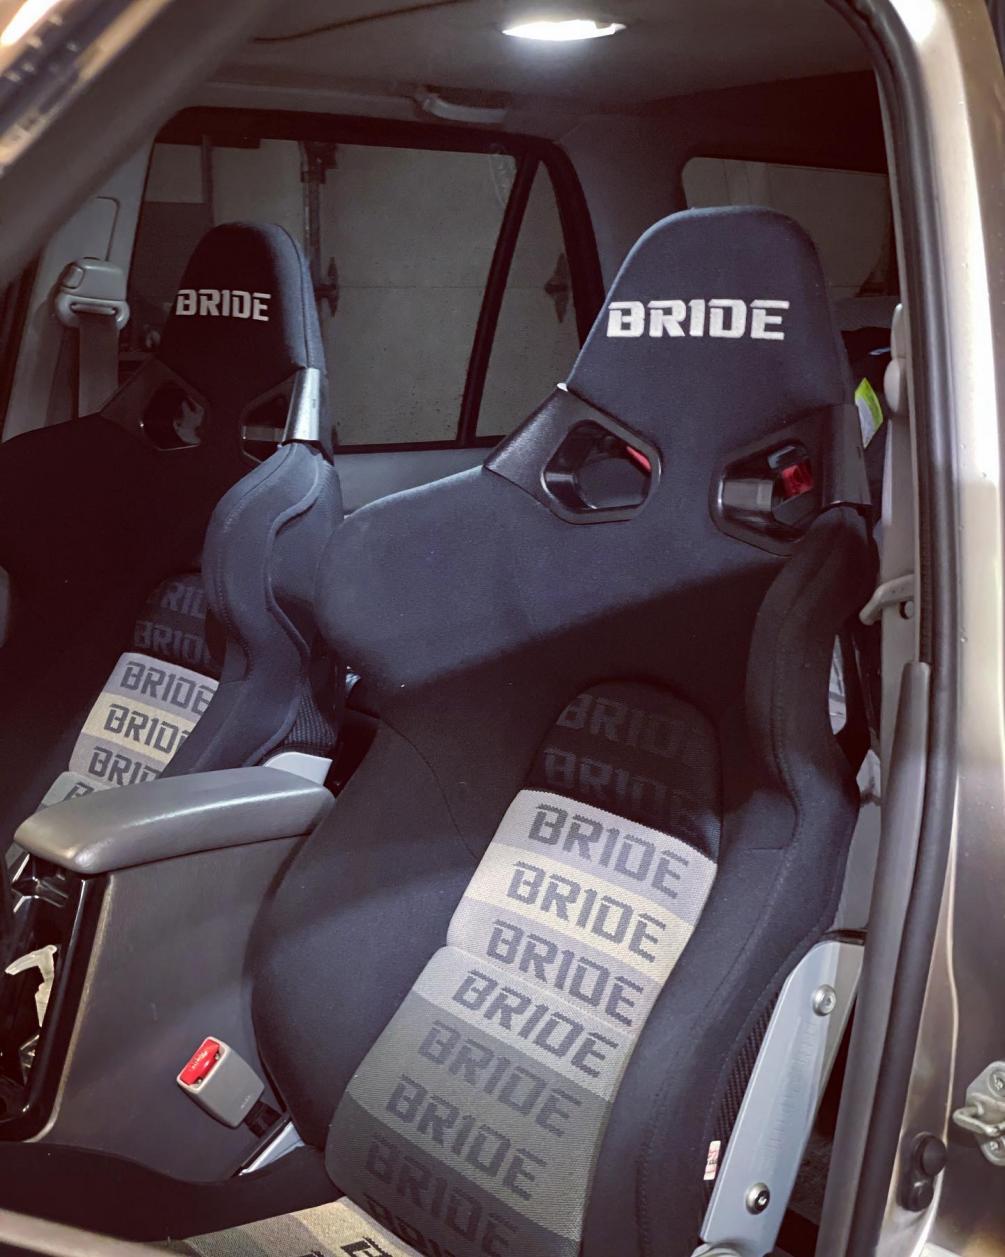 BRIDE Vorga seats installed-1516f676-76c5-4e3e-b2d9-94ca9f275c58-jpg